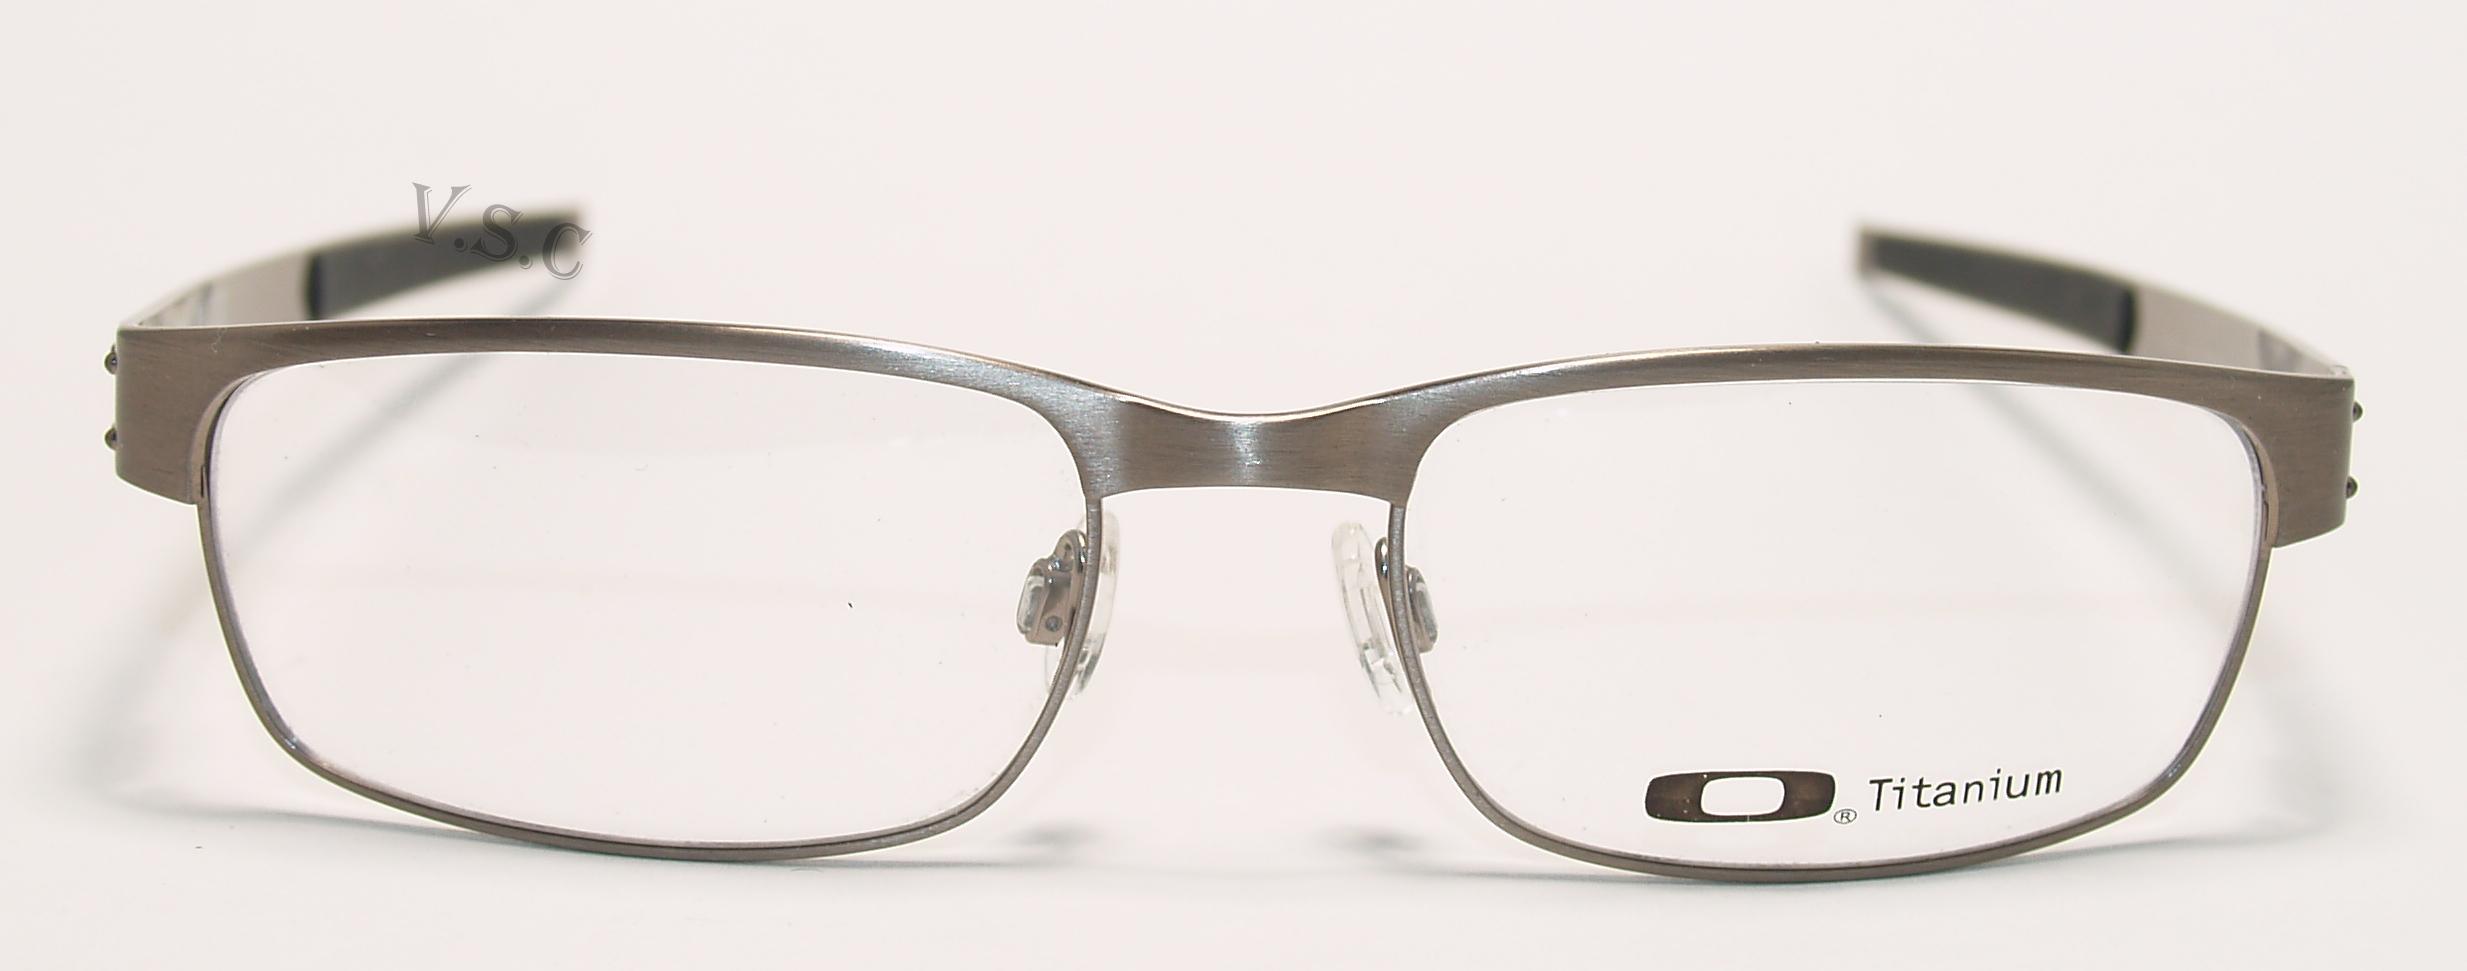 oakley metal plate eyeglasses prescription eye glasses